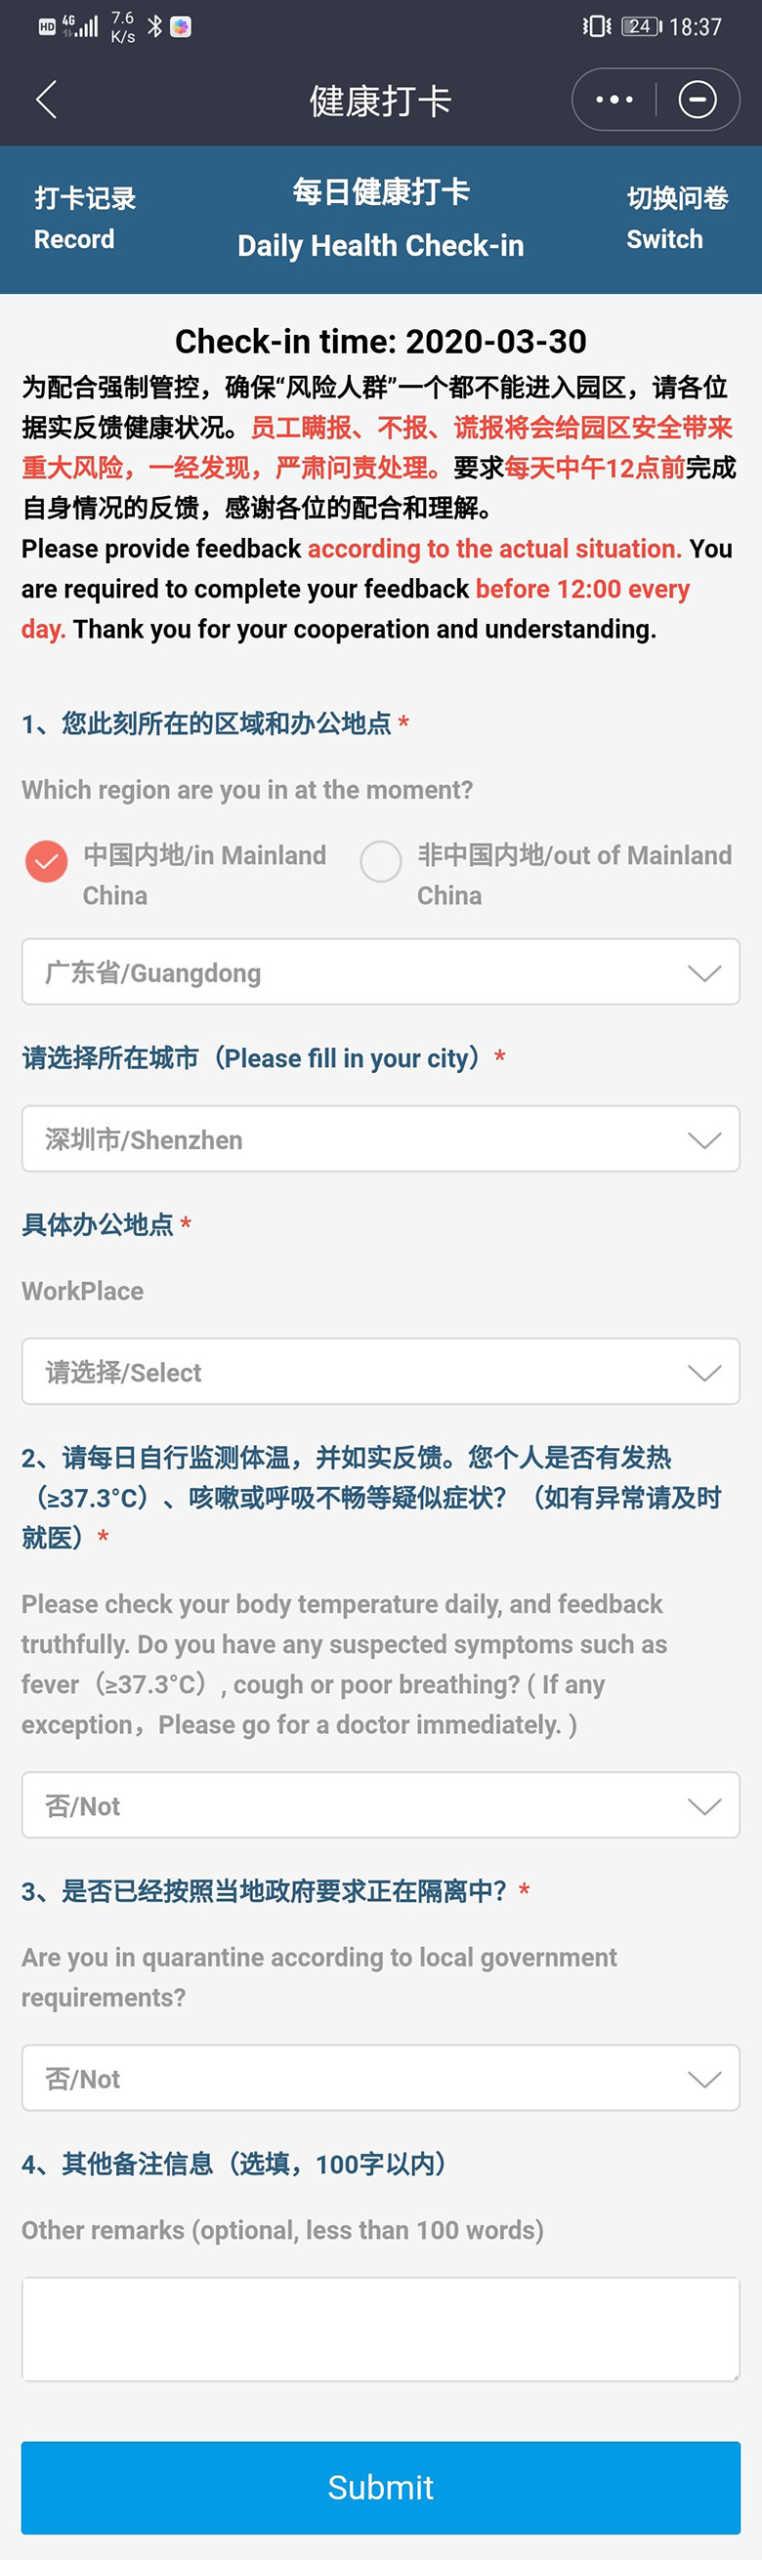 Huawei consult aplicatie